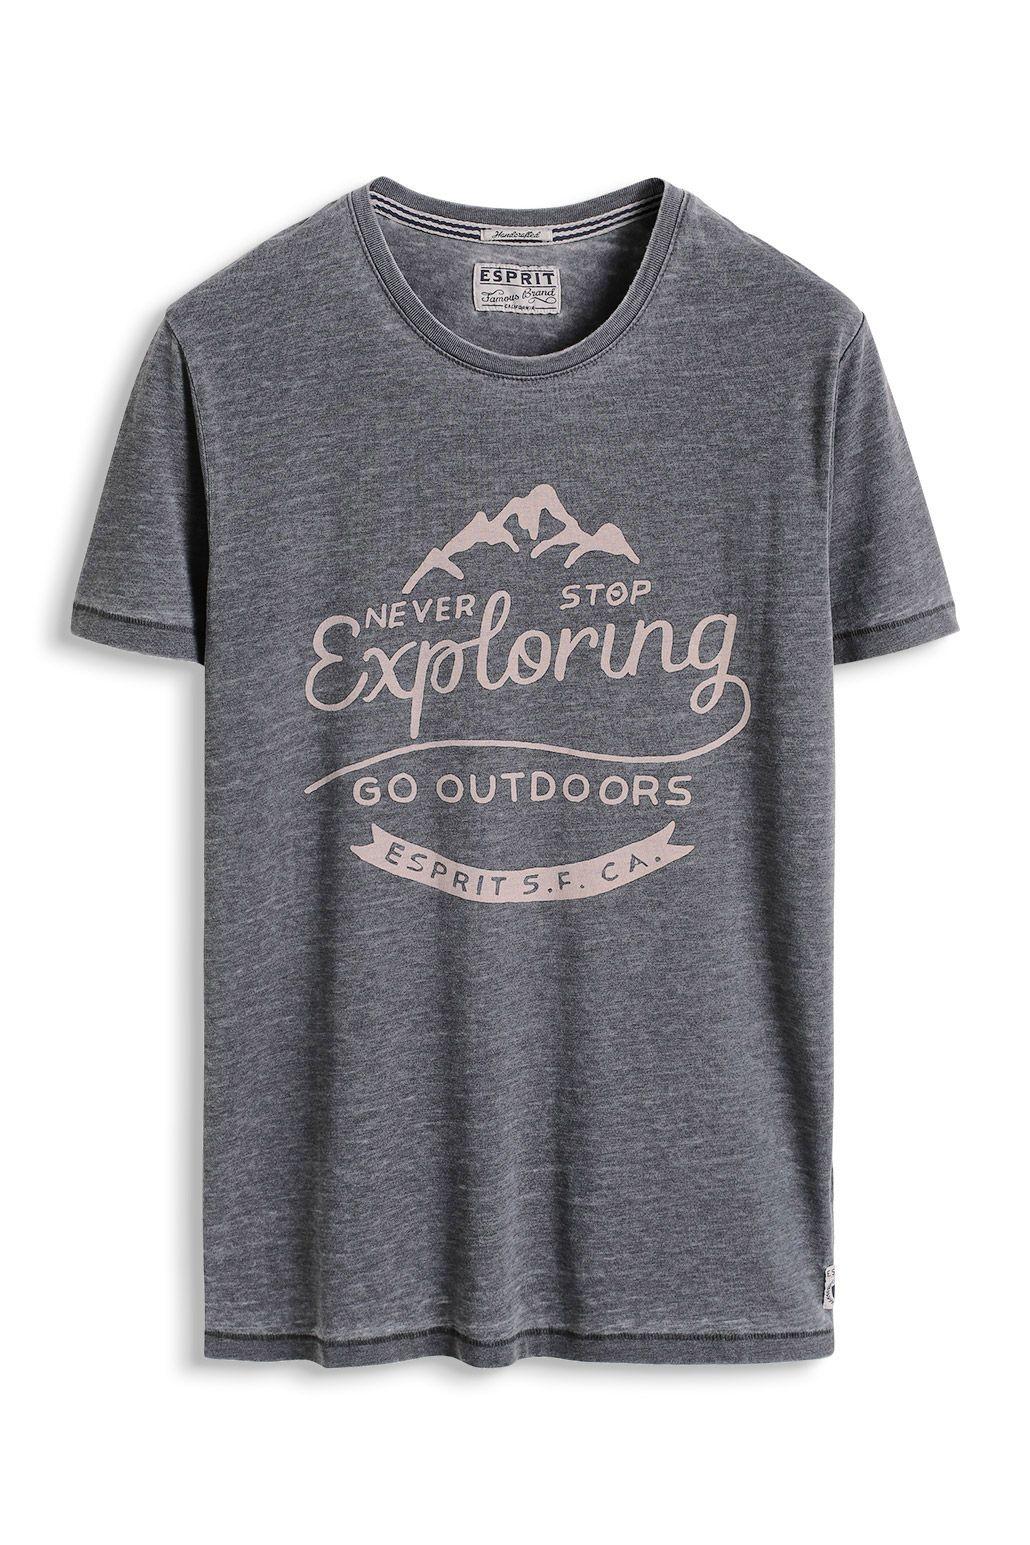 davidemartini.ink for Esprit Jersey T Shirt mit Print